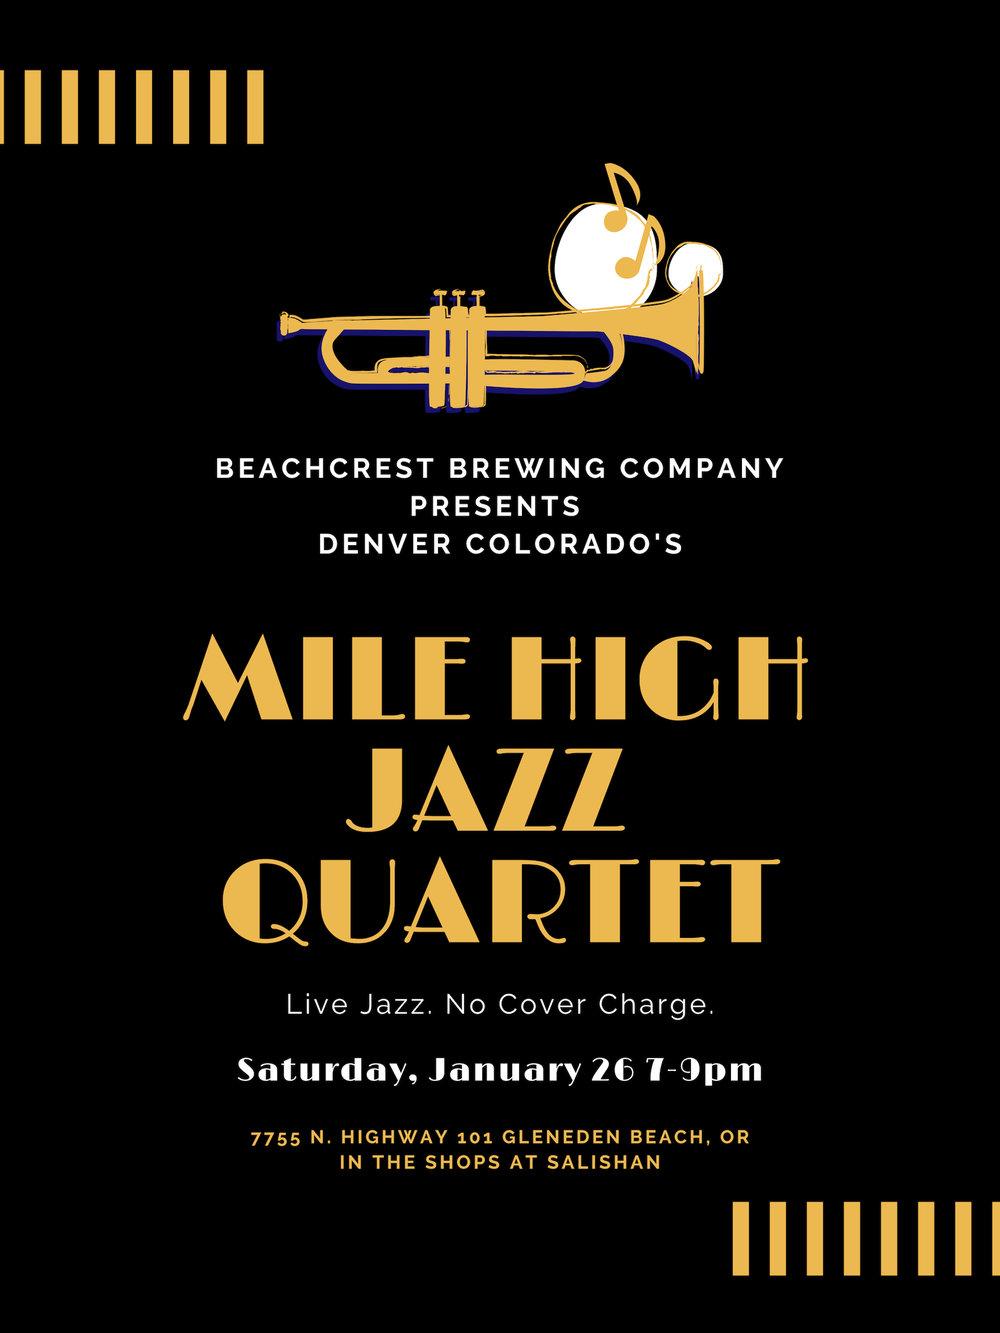 Mile High Jazz Quartet.jpg